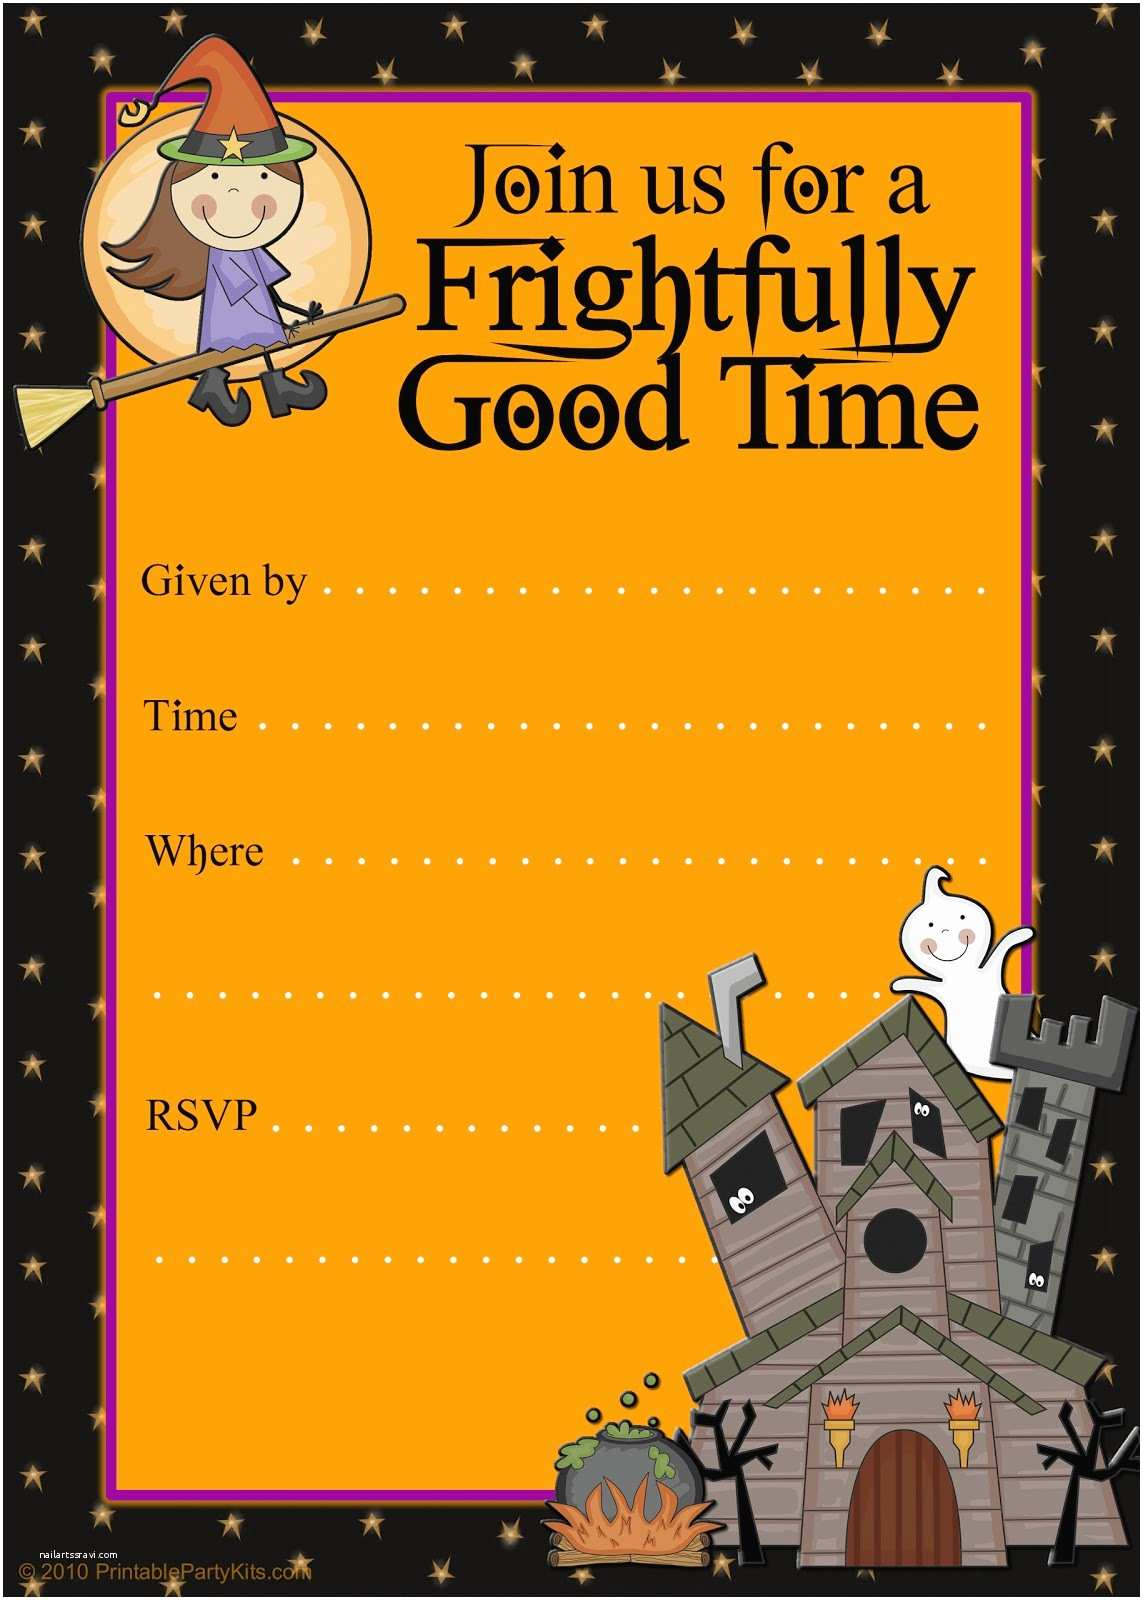 Free Halloween Party Invitations Free Printable Party Invitations Printable Good Witch